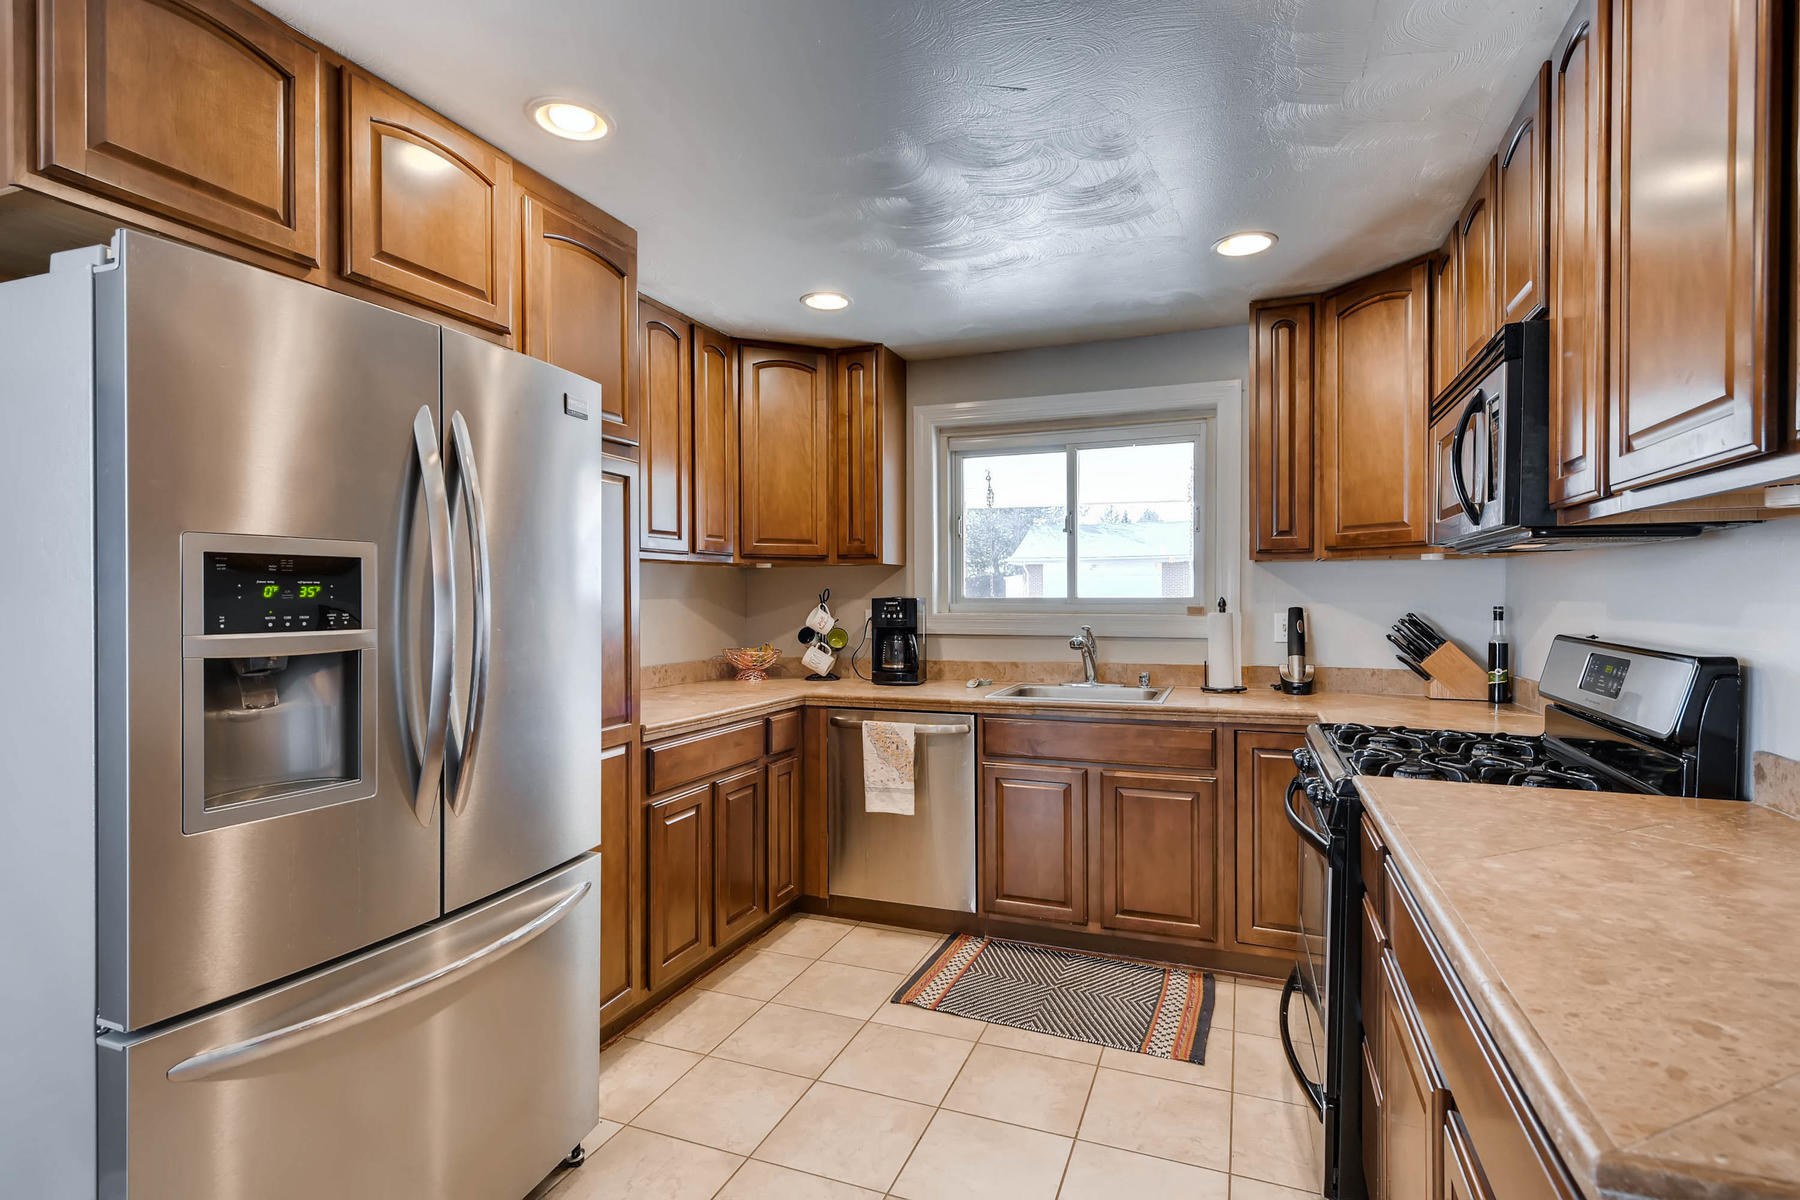 6676 S Kit Carson St-MLS_Size-007-21-Kitchen-1800x1200-72dpi.jpg